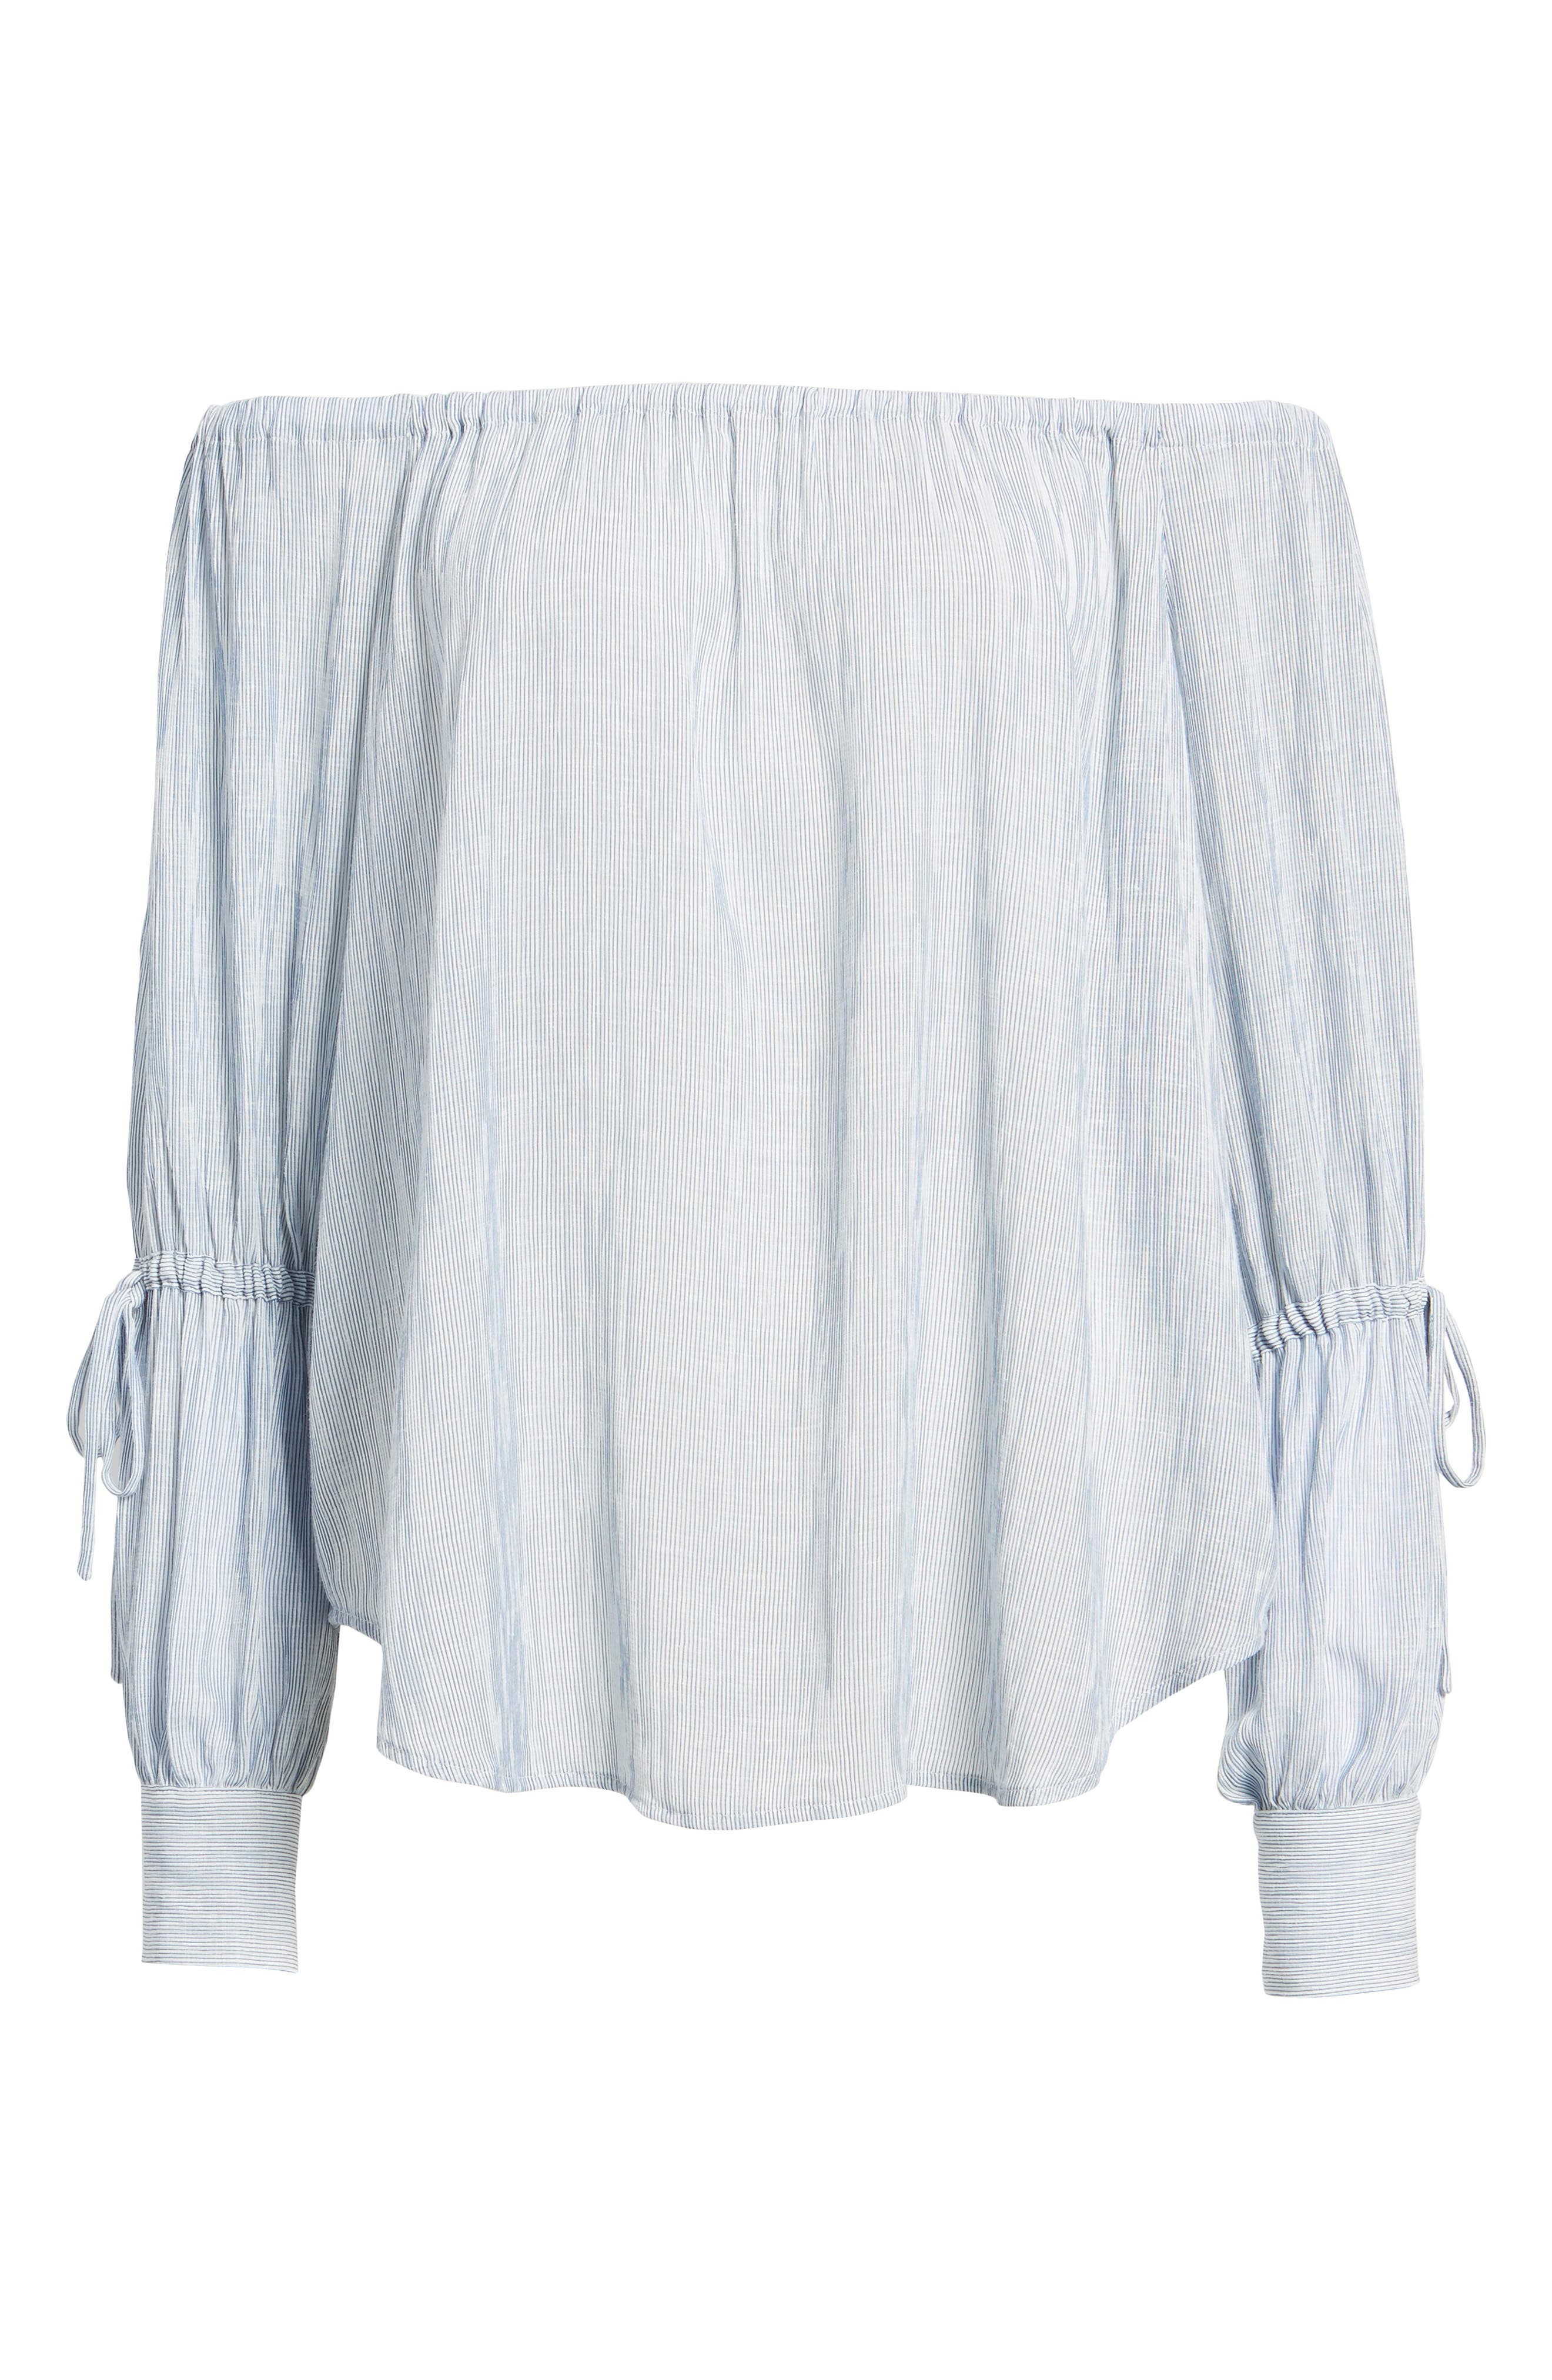 Tallulah Off the Shoulder Blouse,                             Alternate thumbnail 6, color,                             Navy/ White